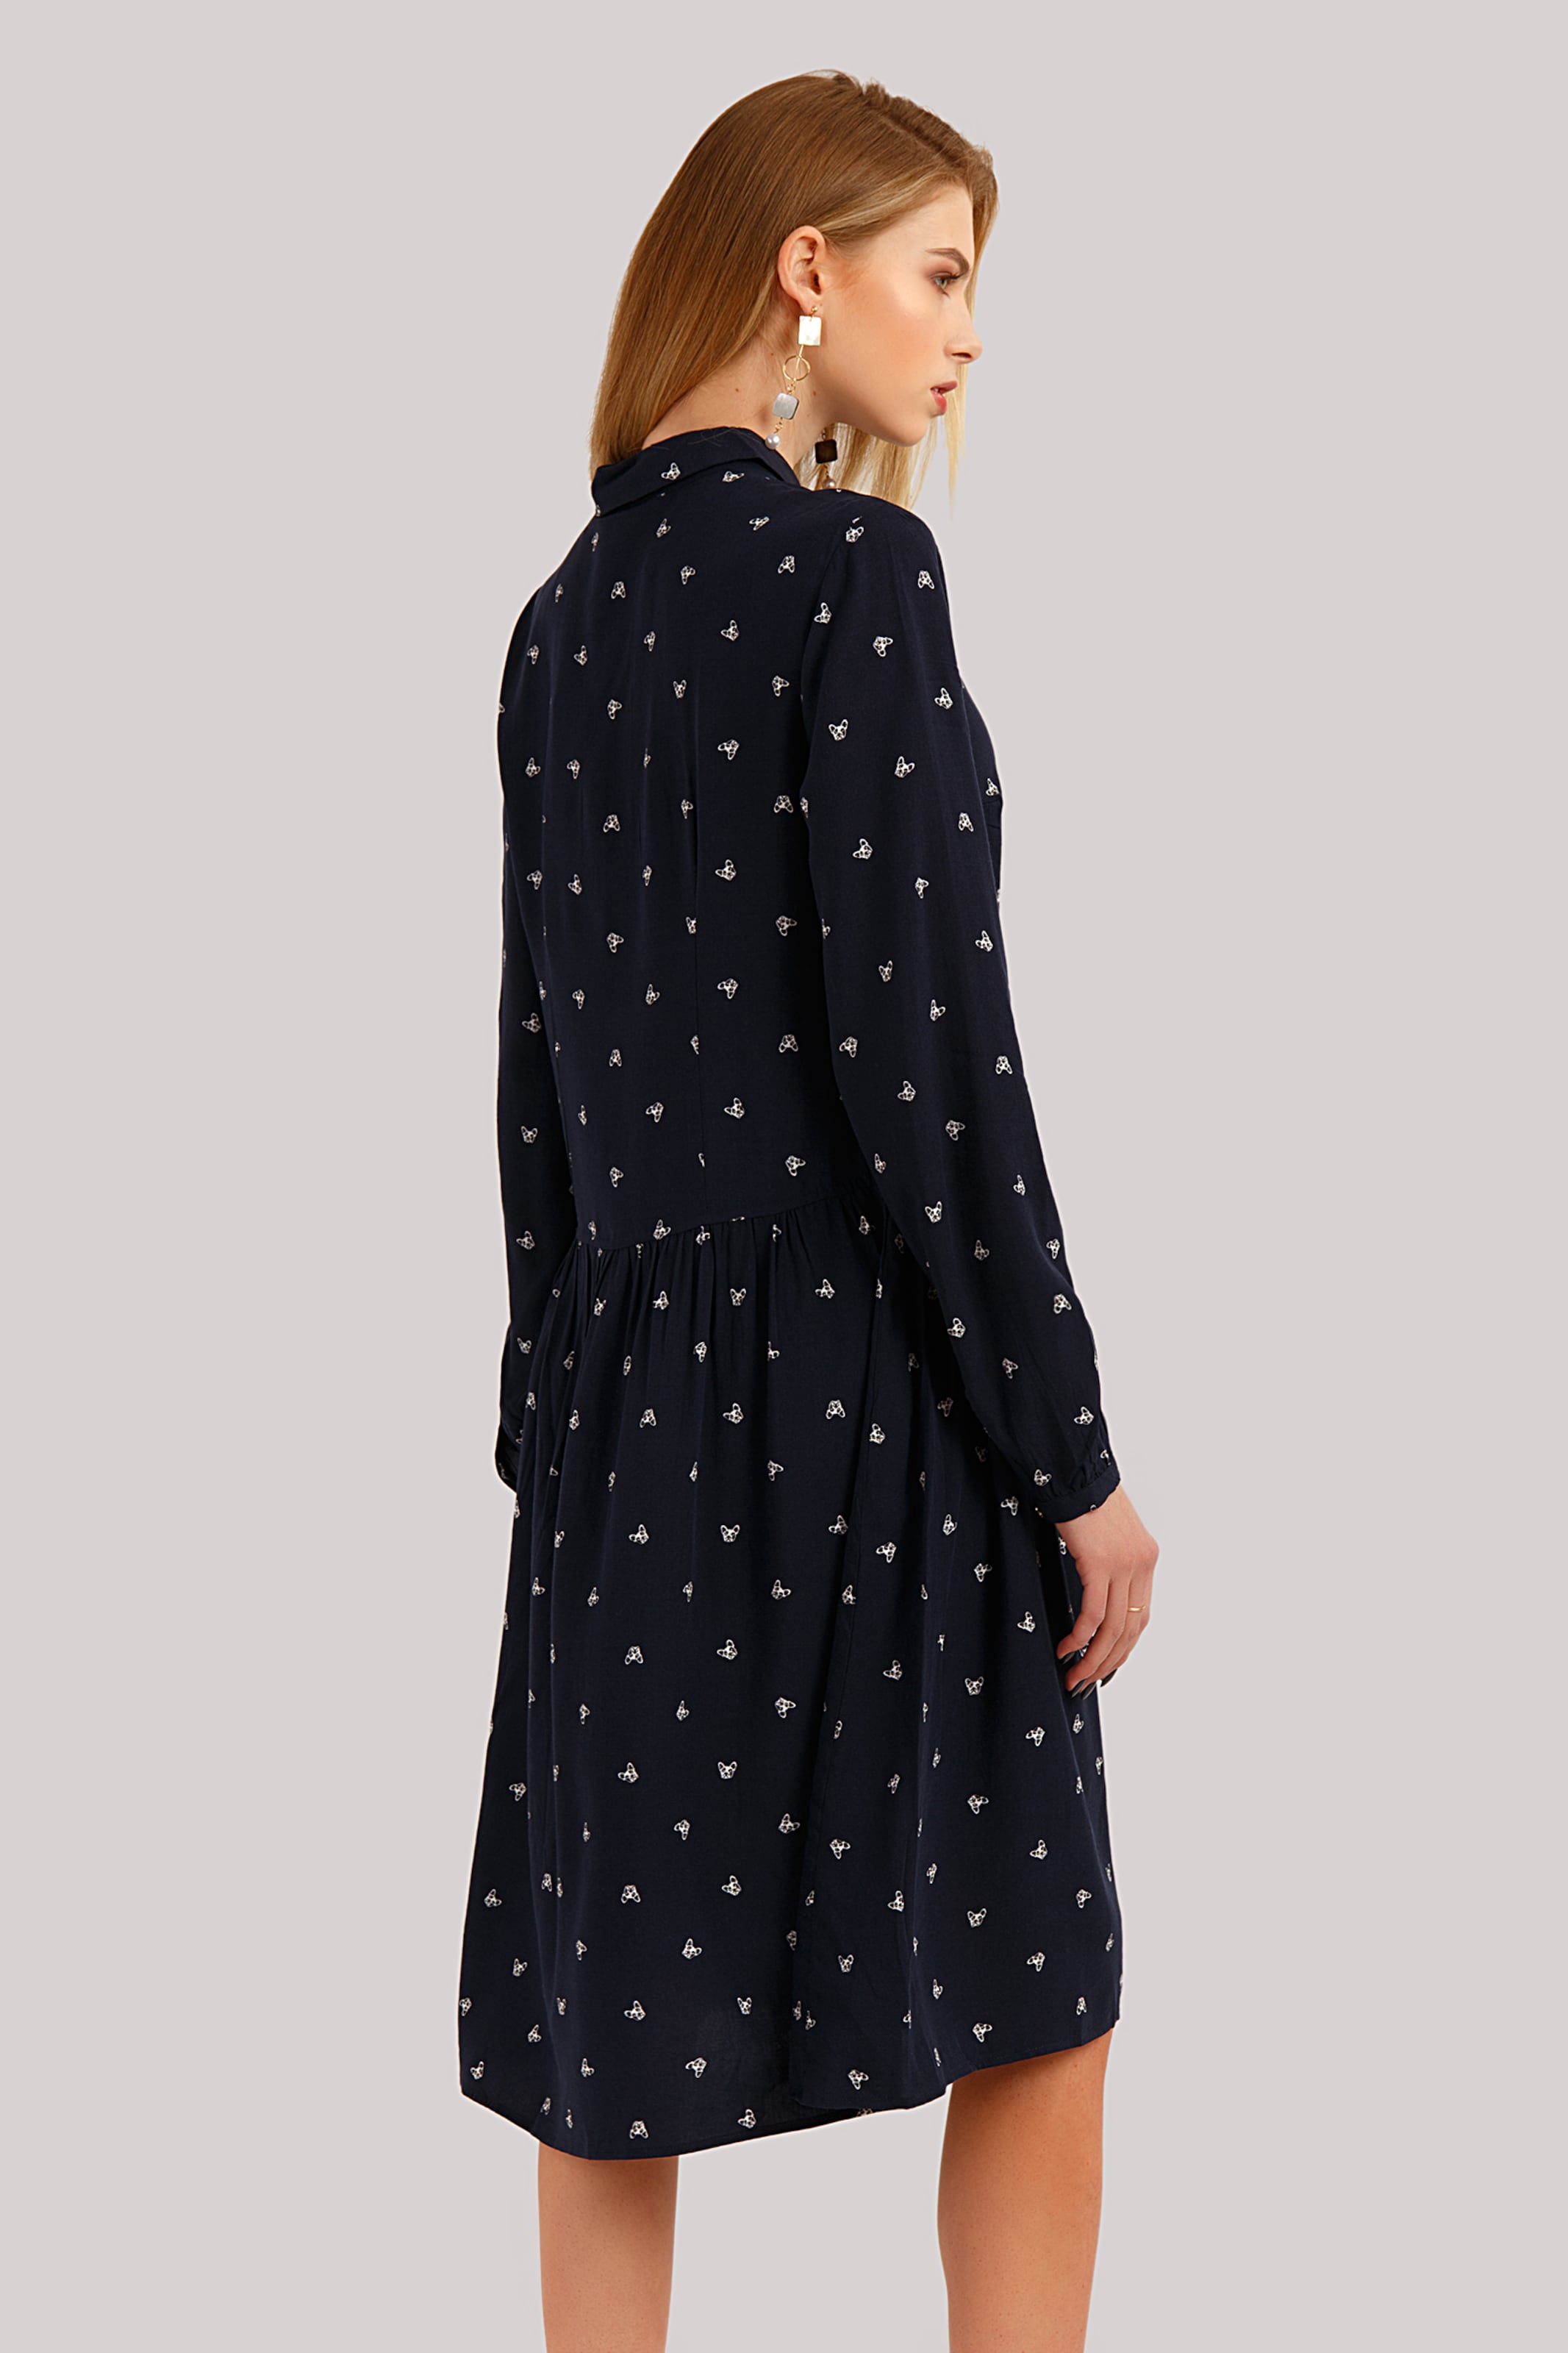 Finn In Finn Flare In NachtblauWeiß Flare Kleid Kleid dCoeWrxB